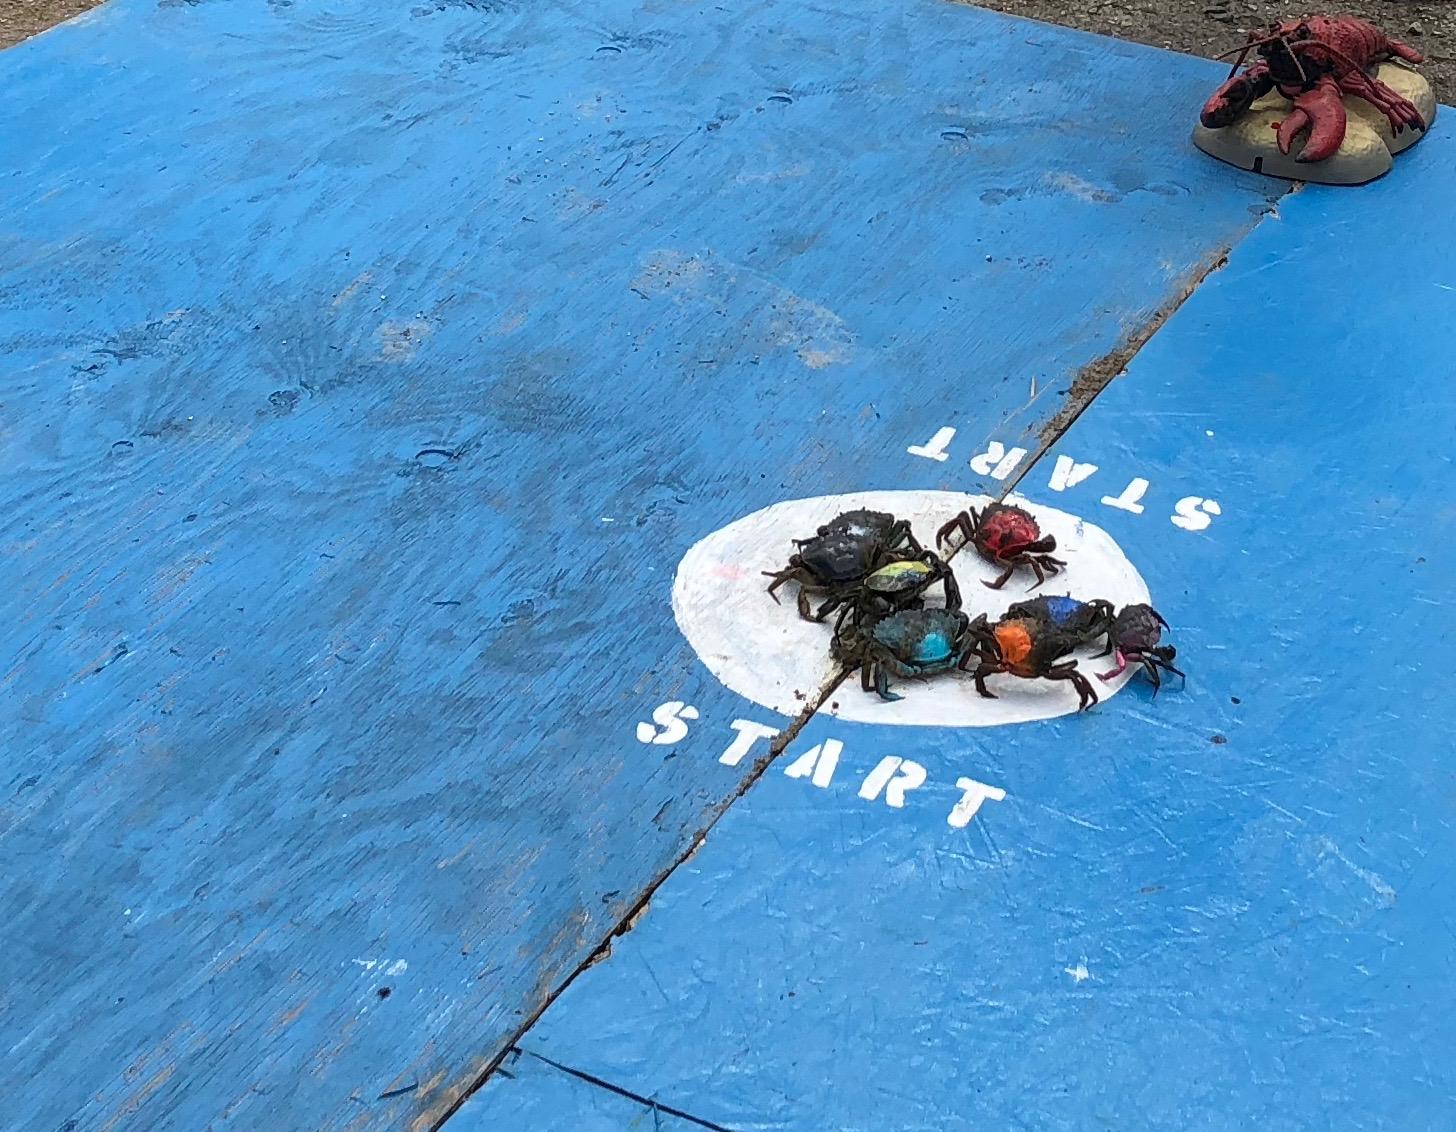 081218-.bucket-lifted-off-crabs